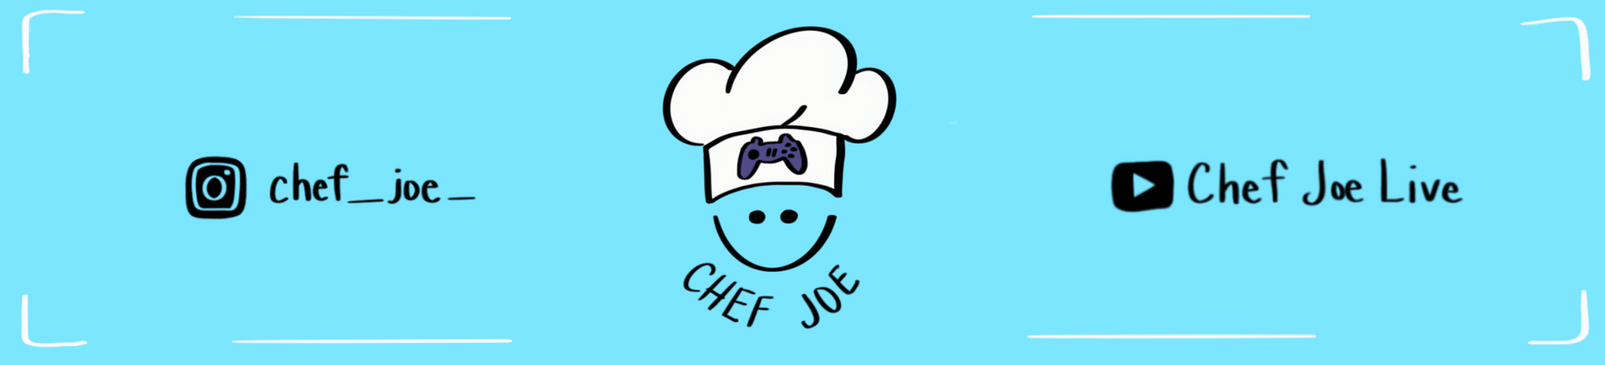 Chef Joe_Logo banner